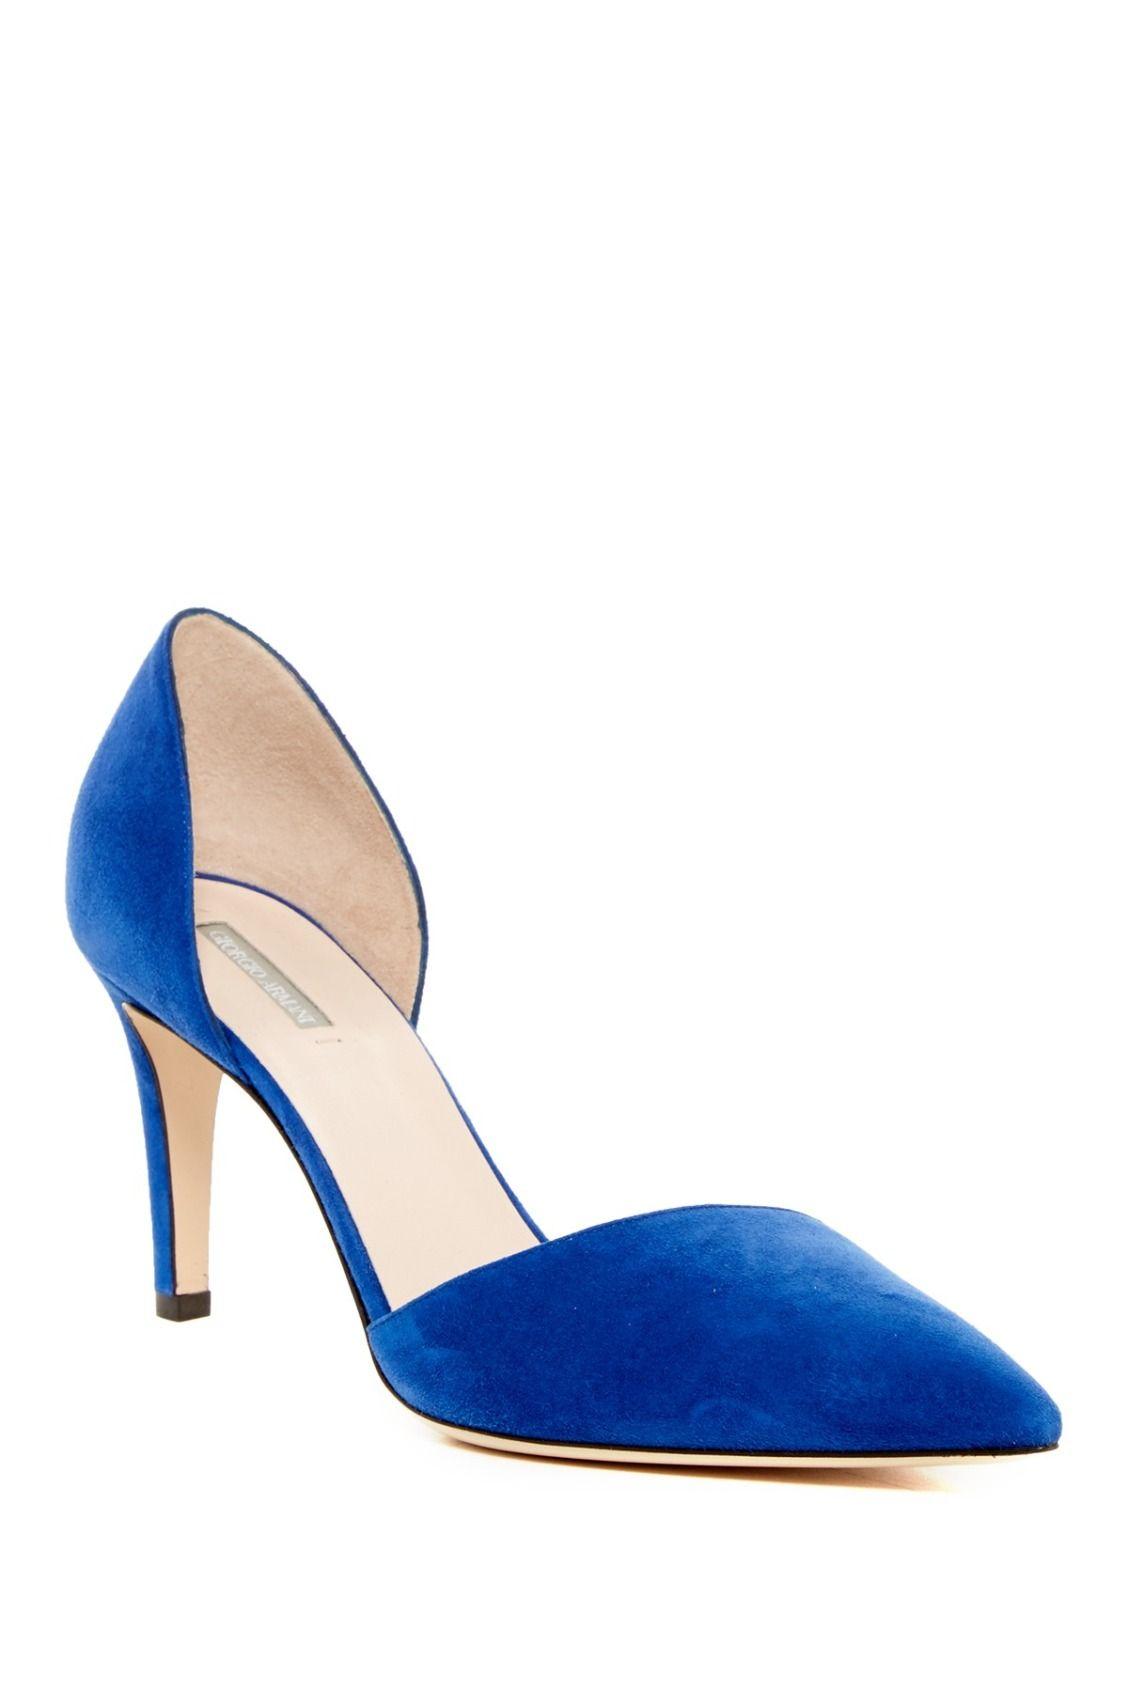 Blue Suede Giorgio Armani d'Orsay Pumps